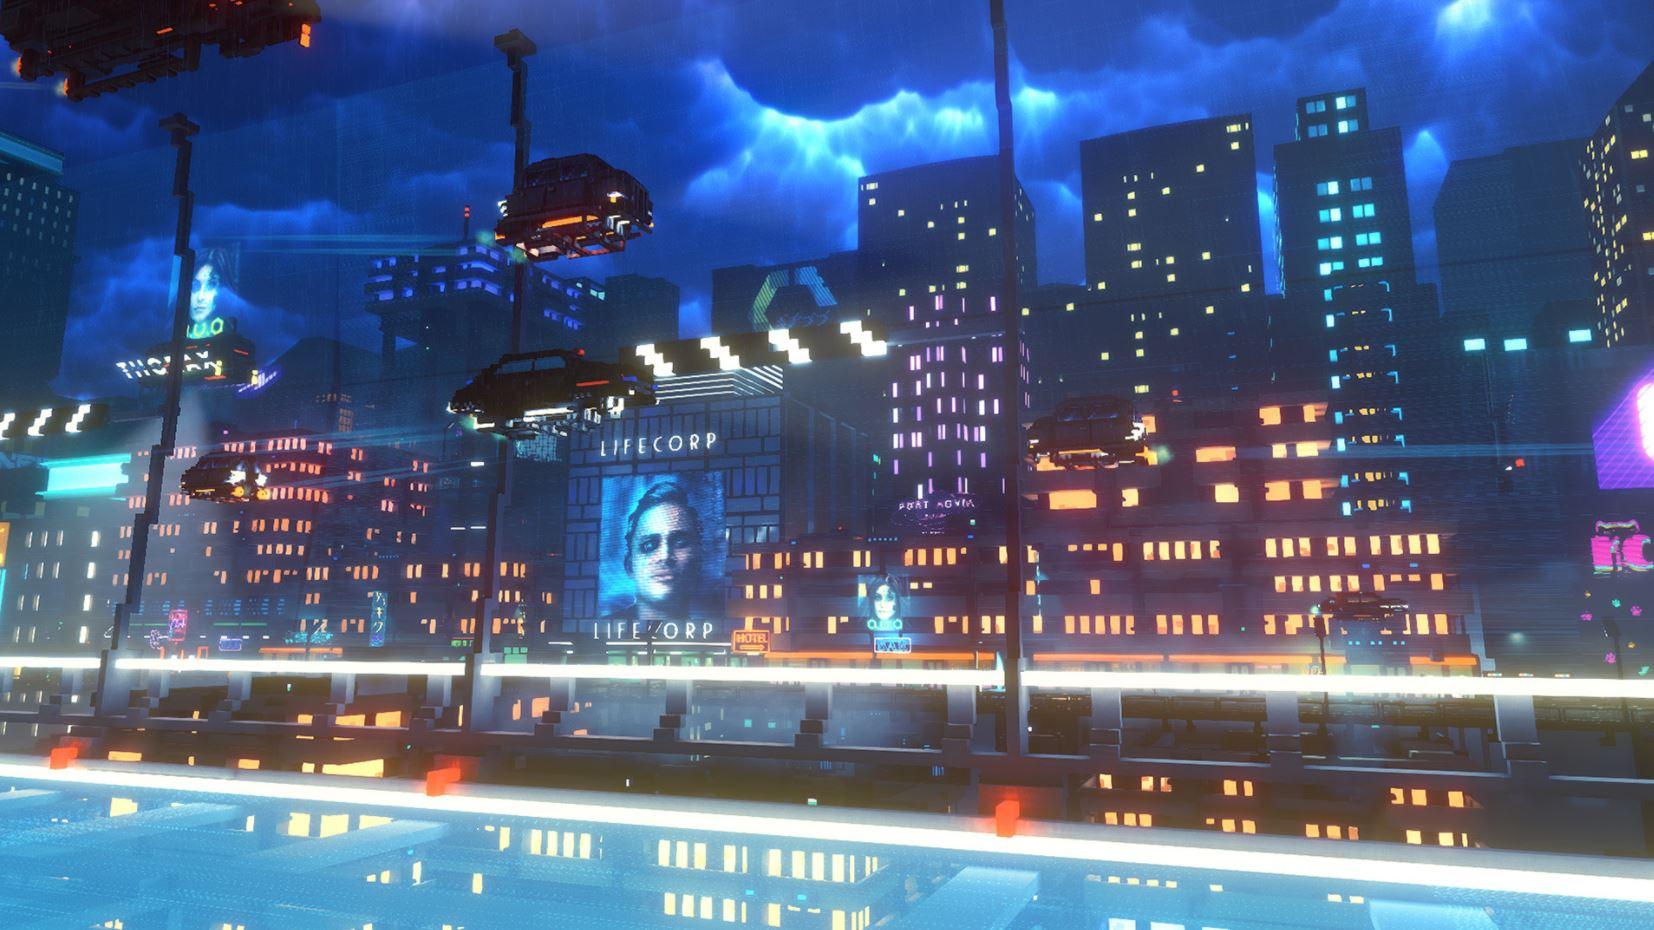 cloudpunk-ps4-review-3